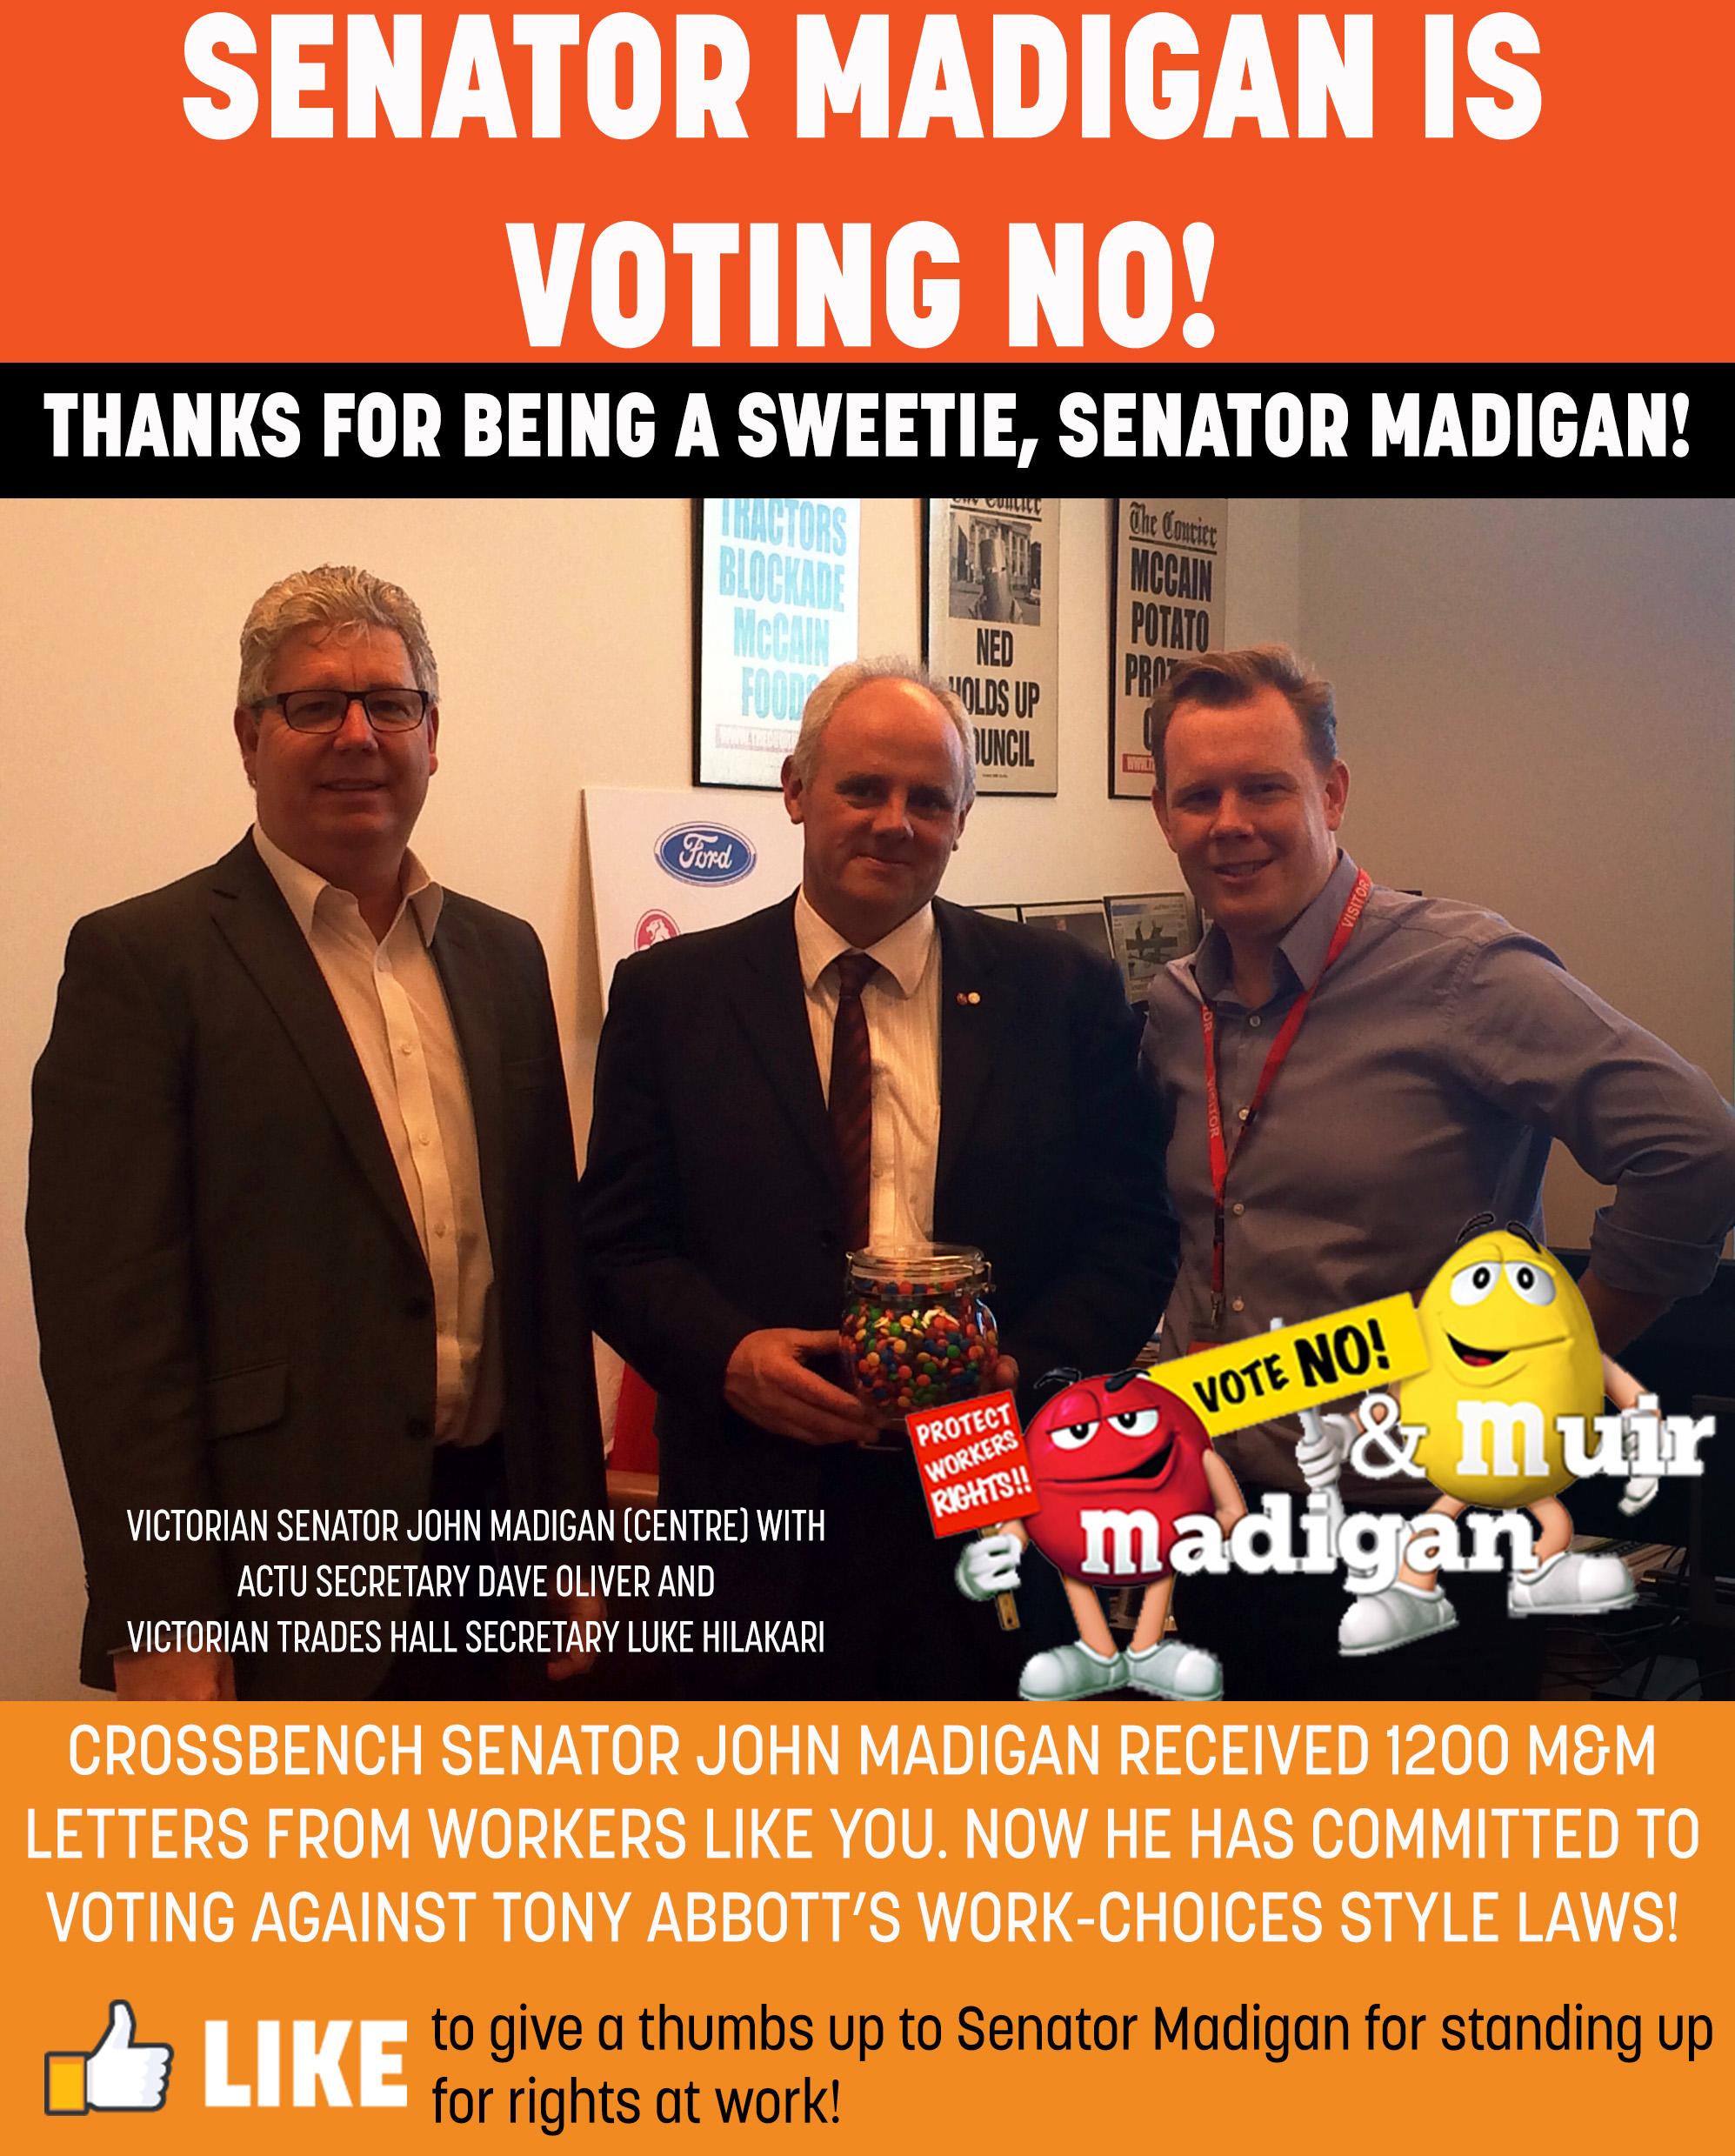 madigan_thanks_2.jpg